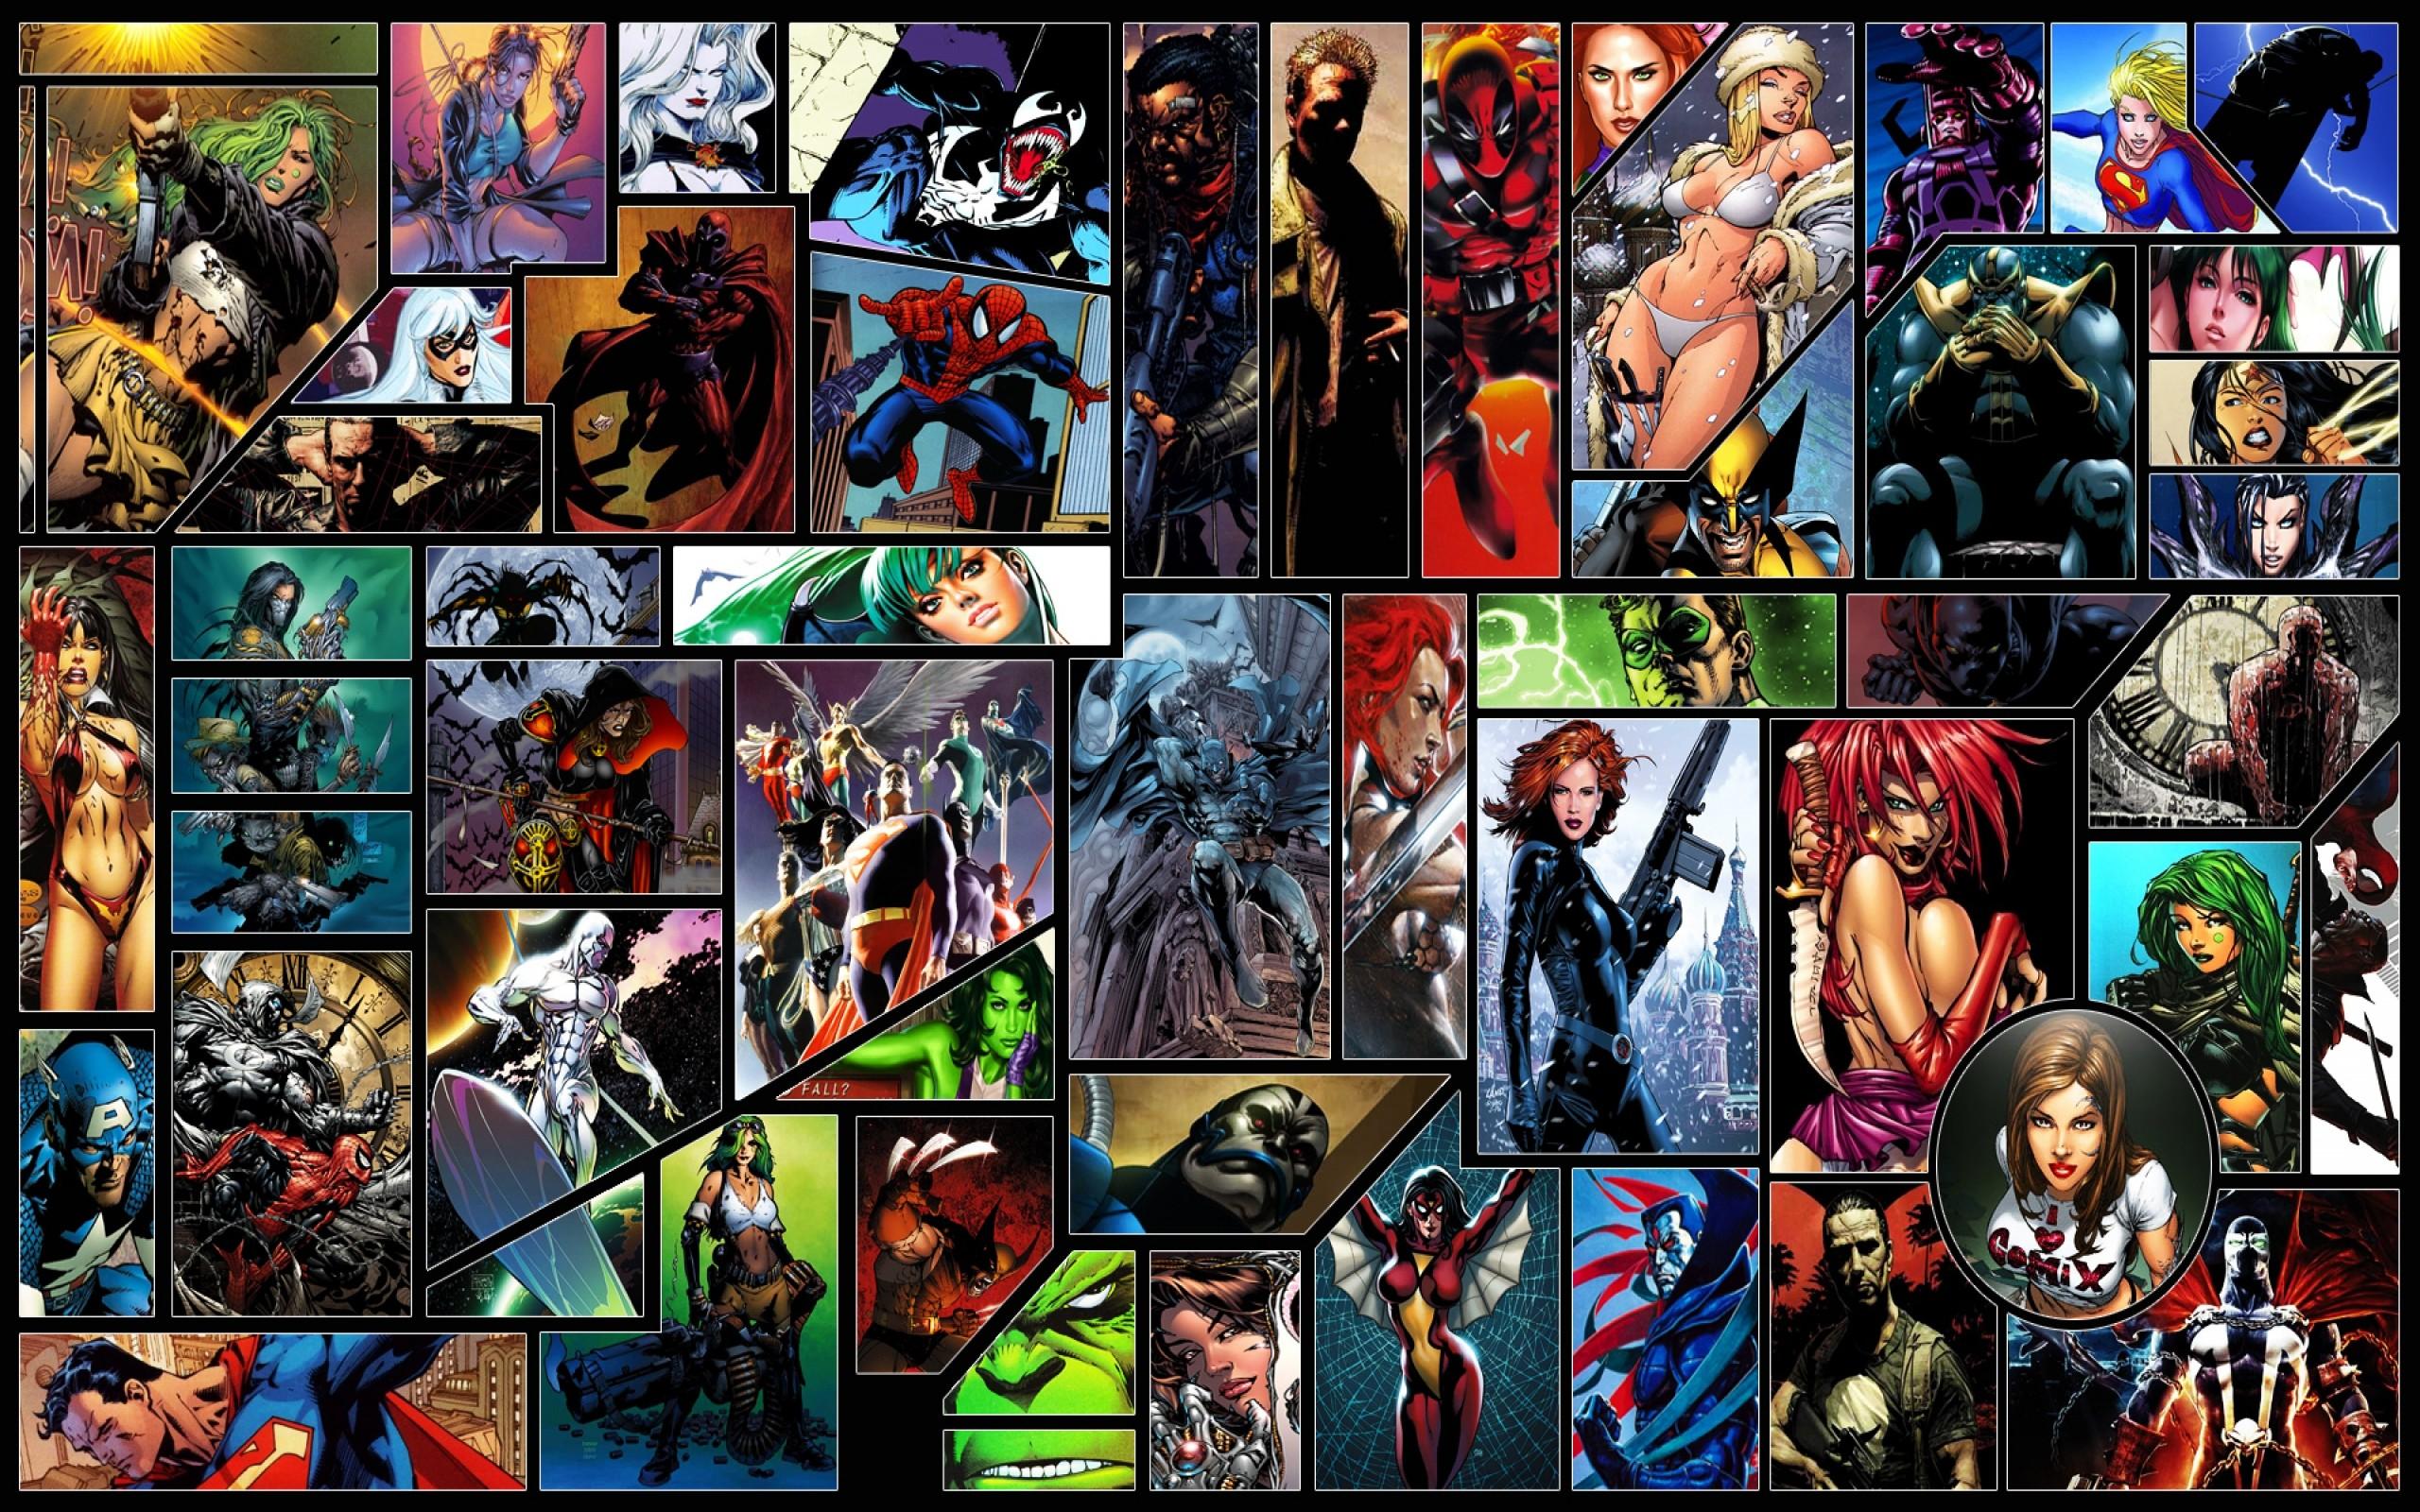 Marvel dc superheroes wallpaper wallpapersafari - Marvel and dc wallpapers ...